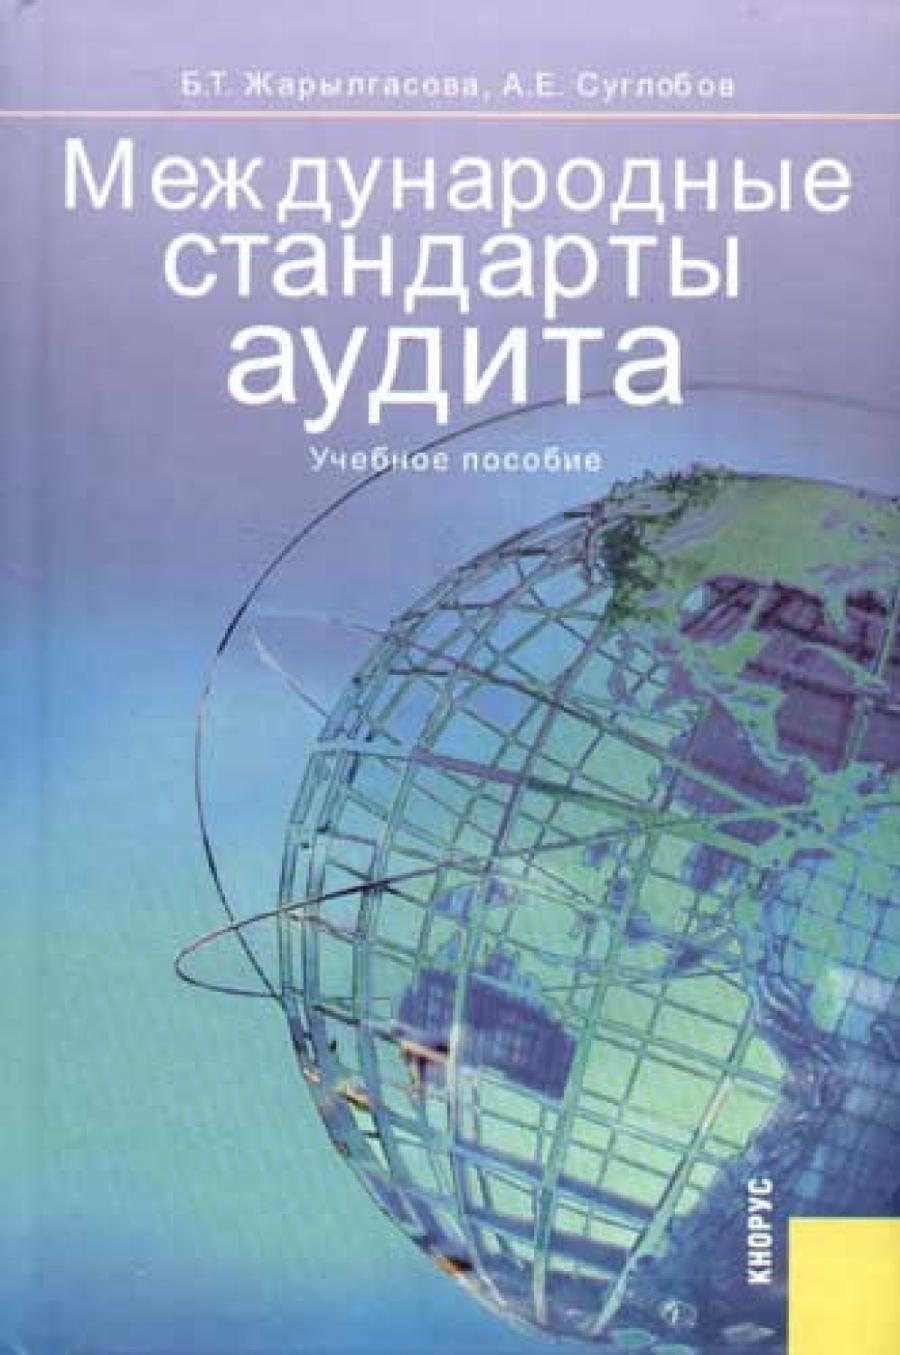 Обложка книги:  суглобов а.е., жарылгасова б.т. - международные стандарты аудита